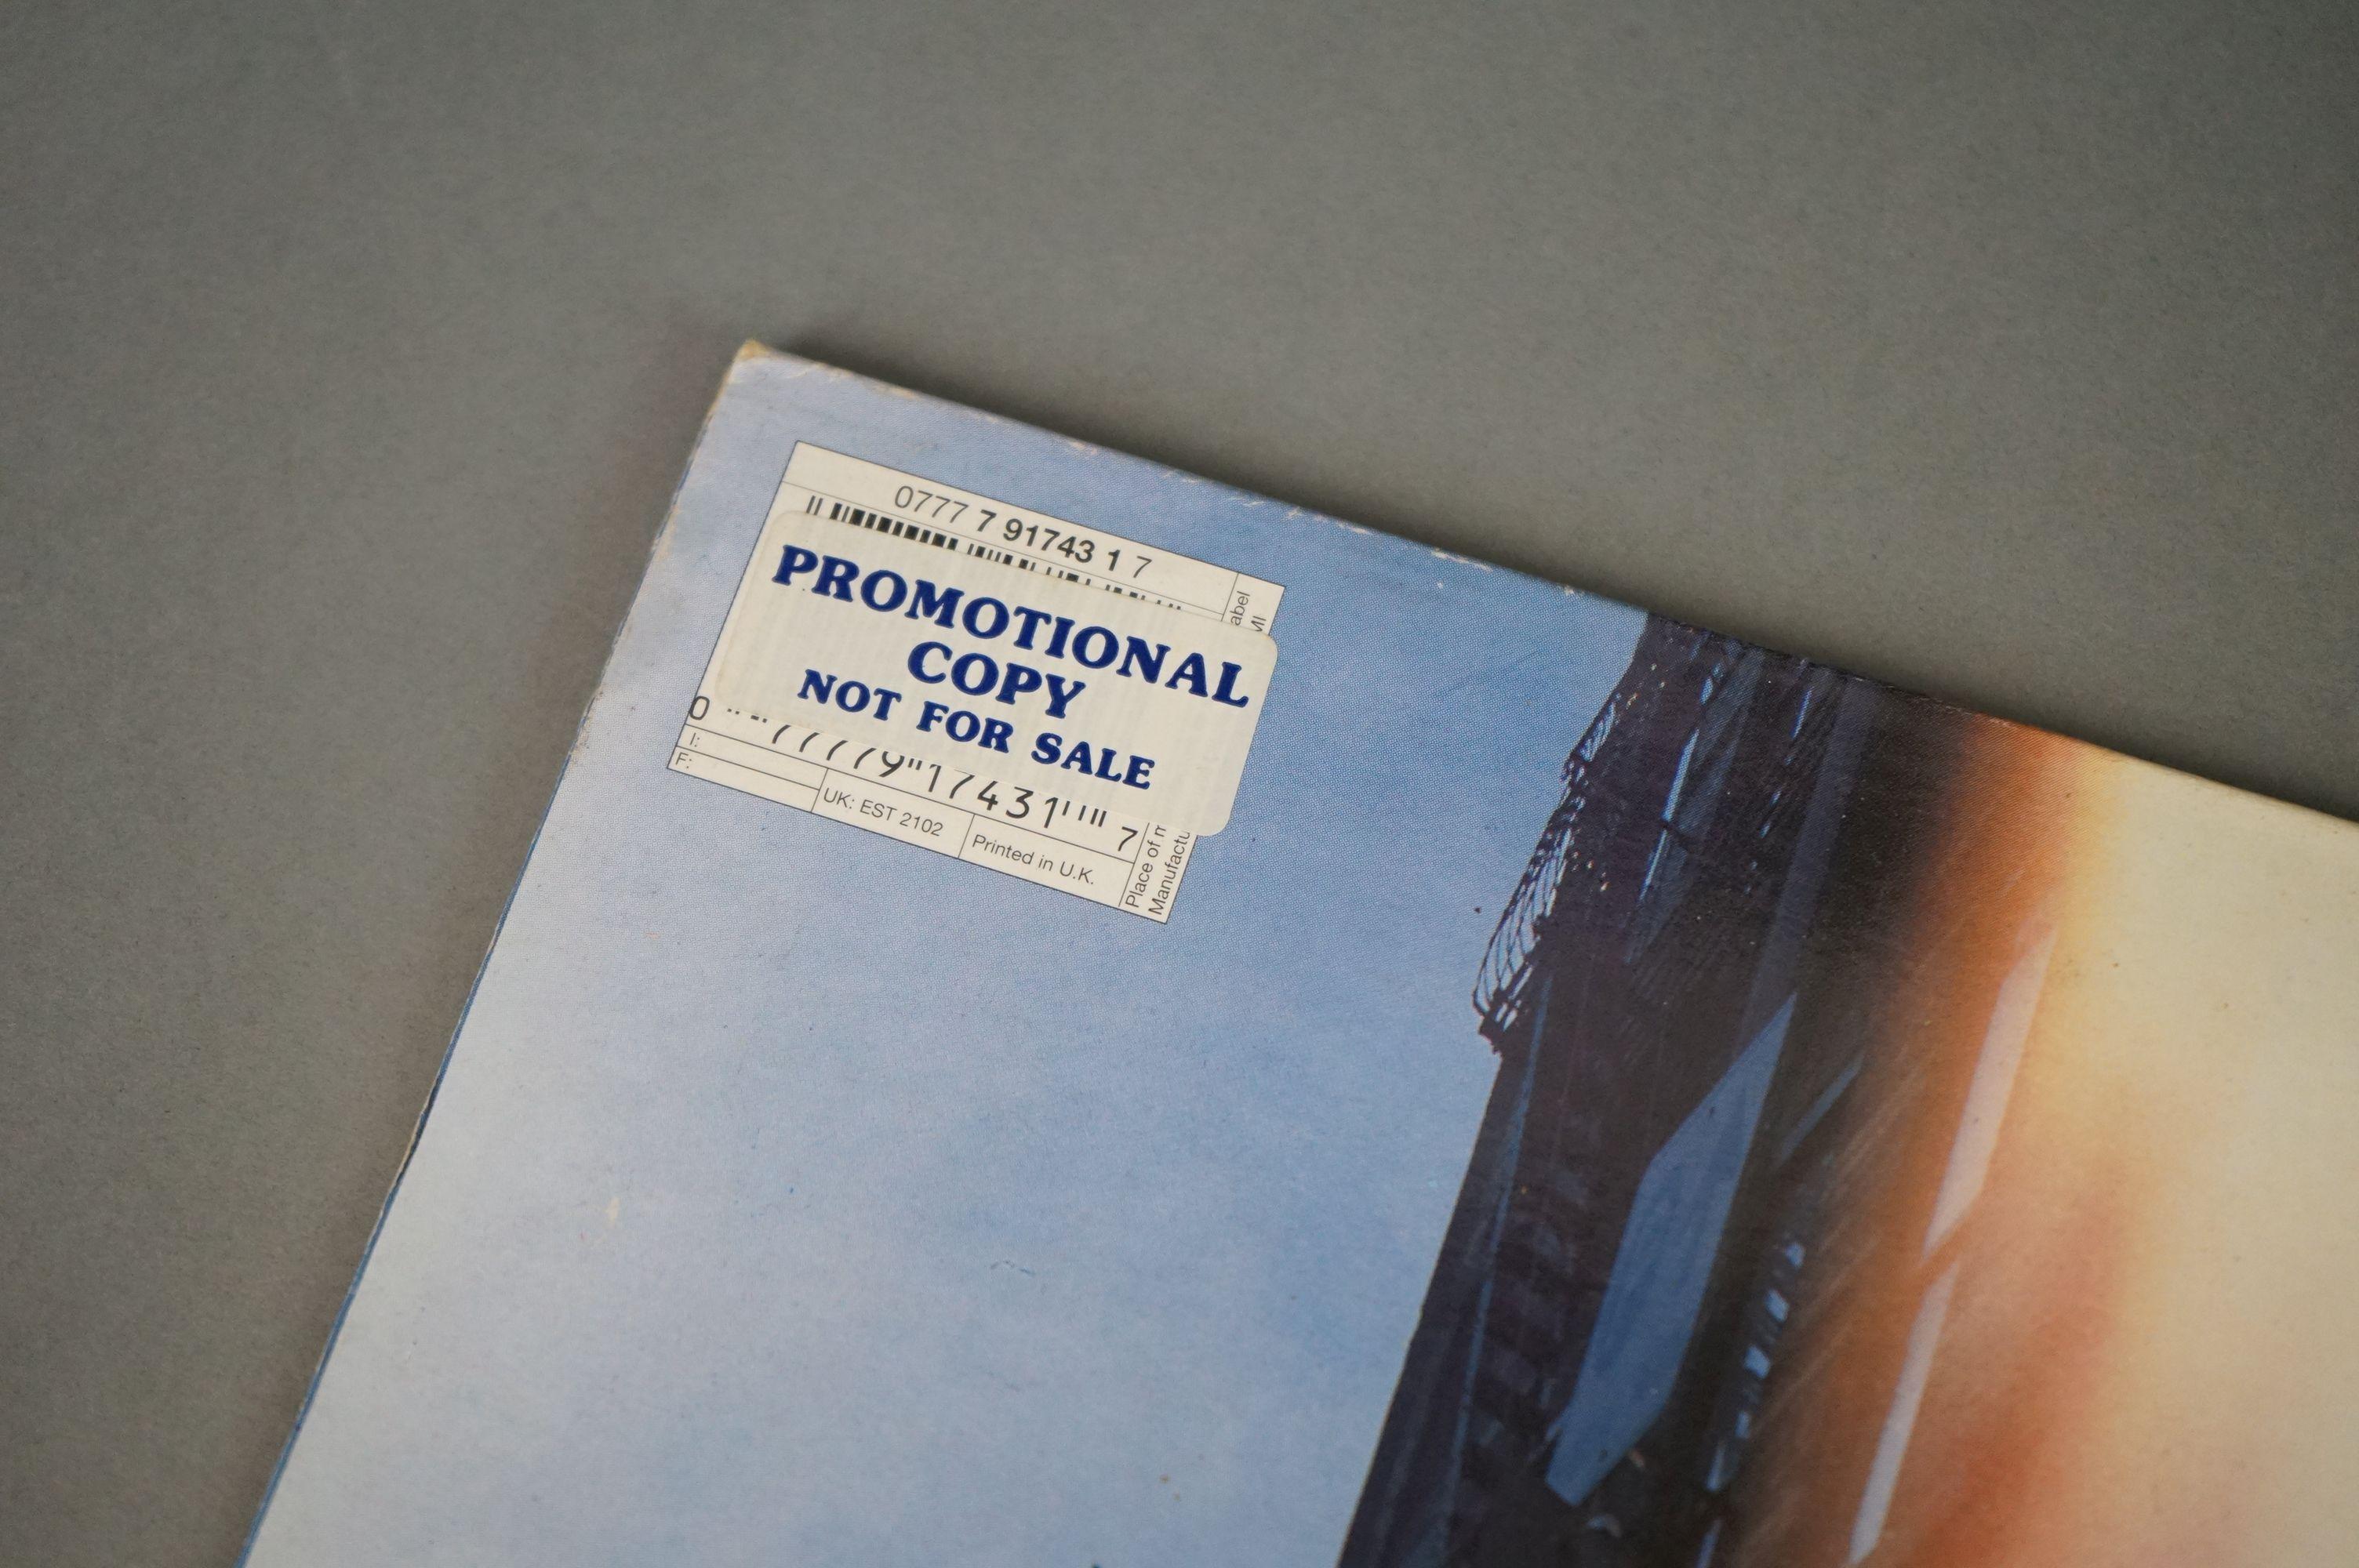 Vinyl - Beastie Boys Paul's Boutique LP on Capitol UK 077779174317 UKEST2102 with 'promotional - Image 4 of 6